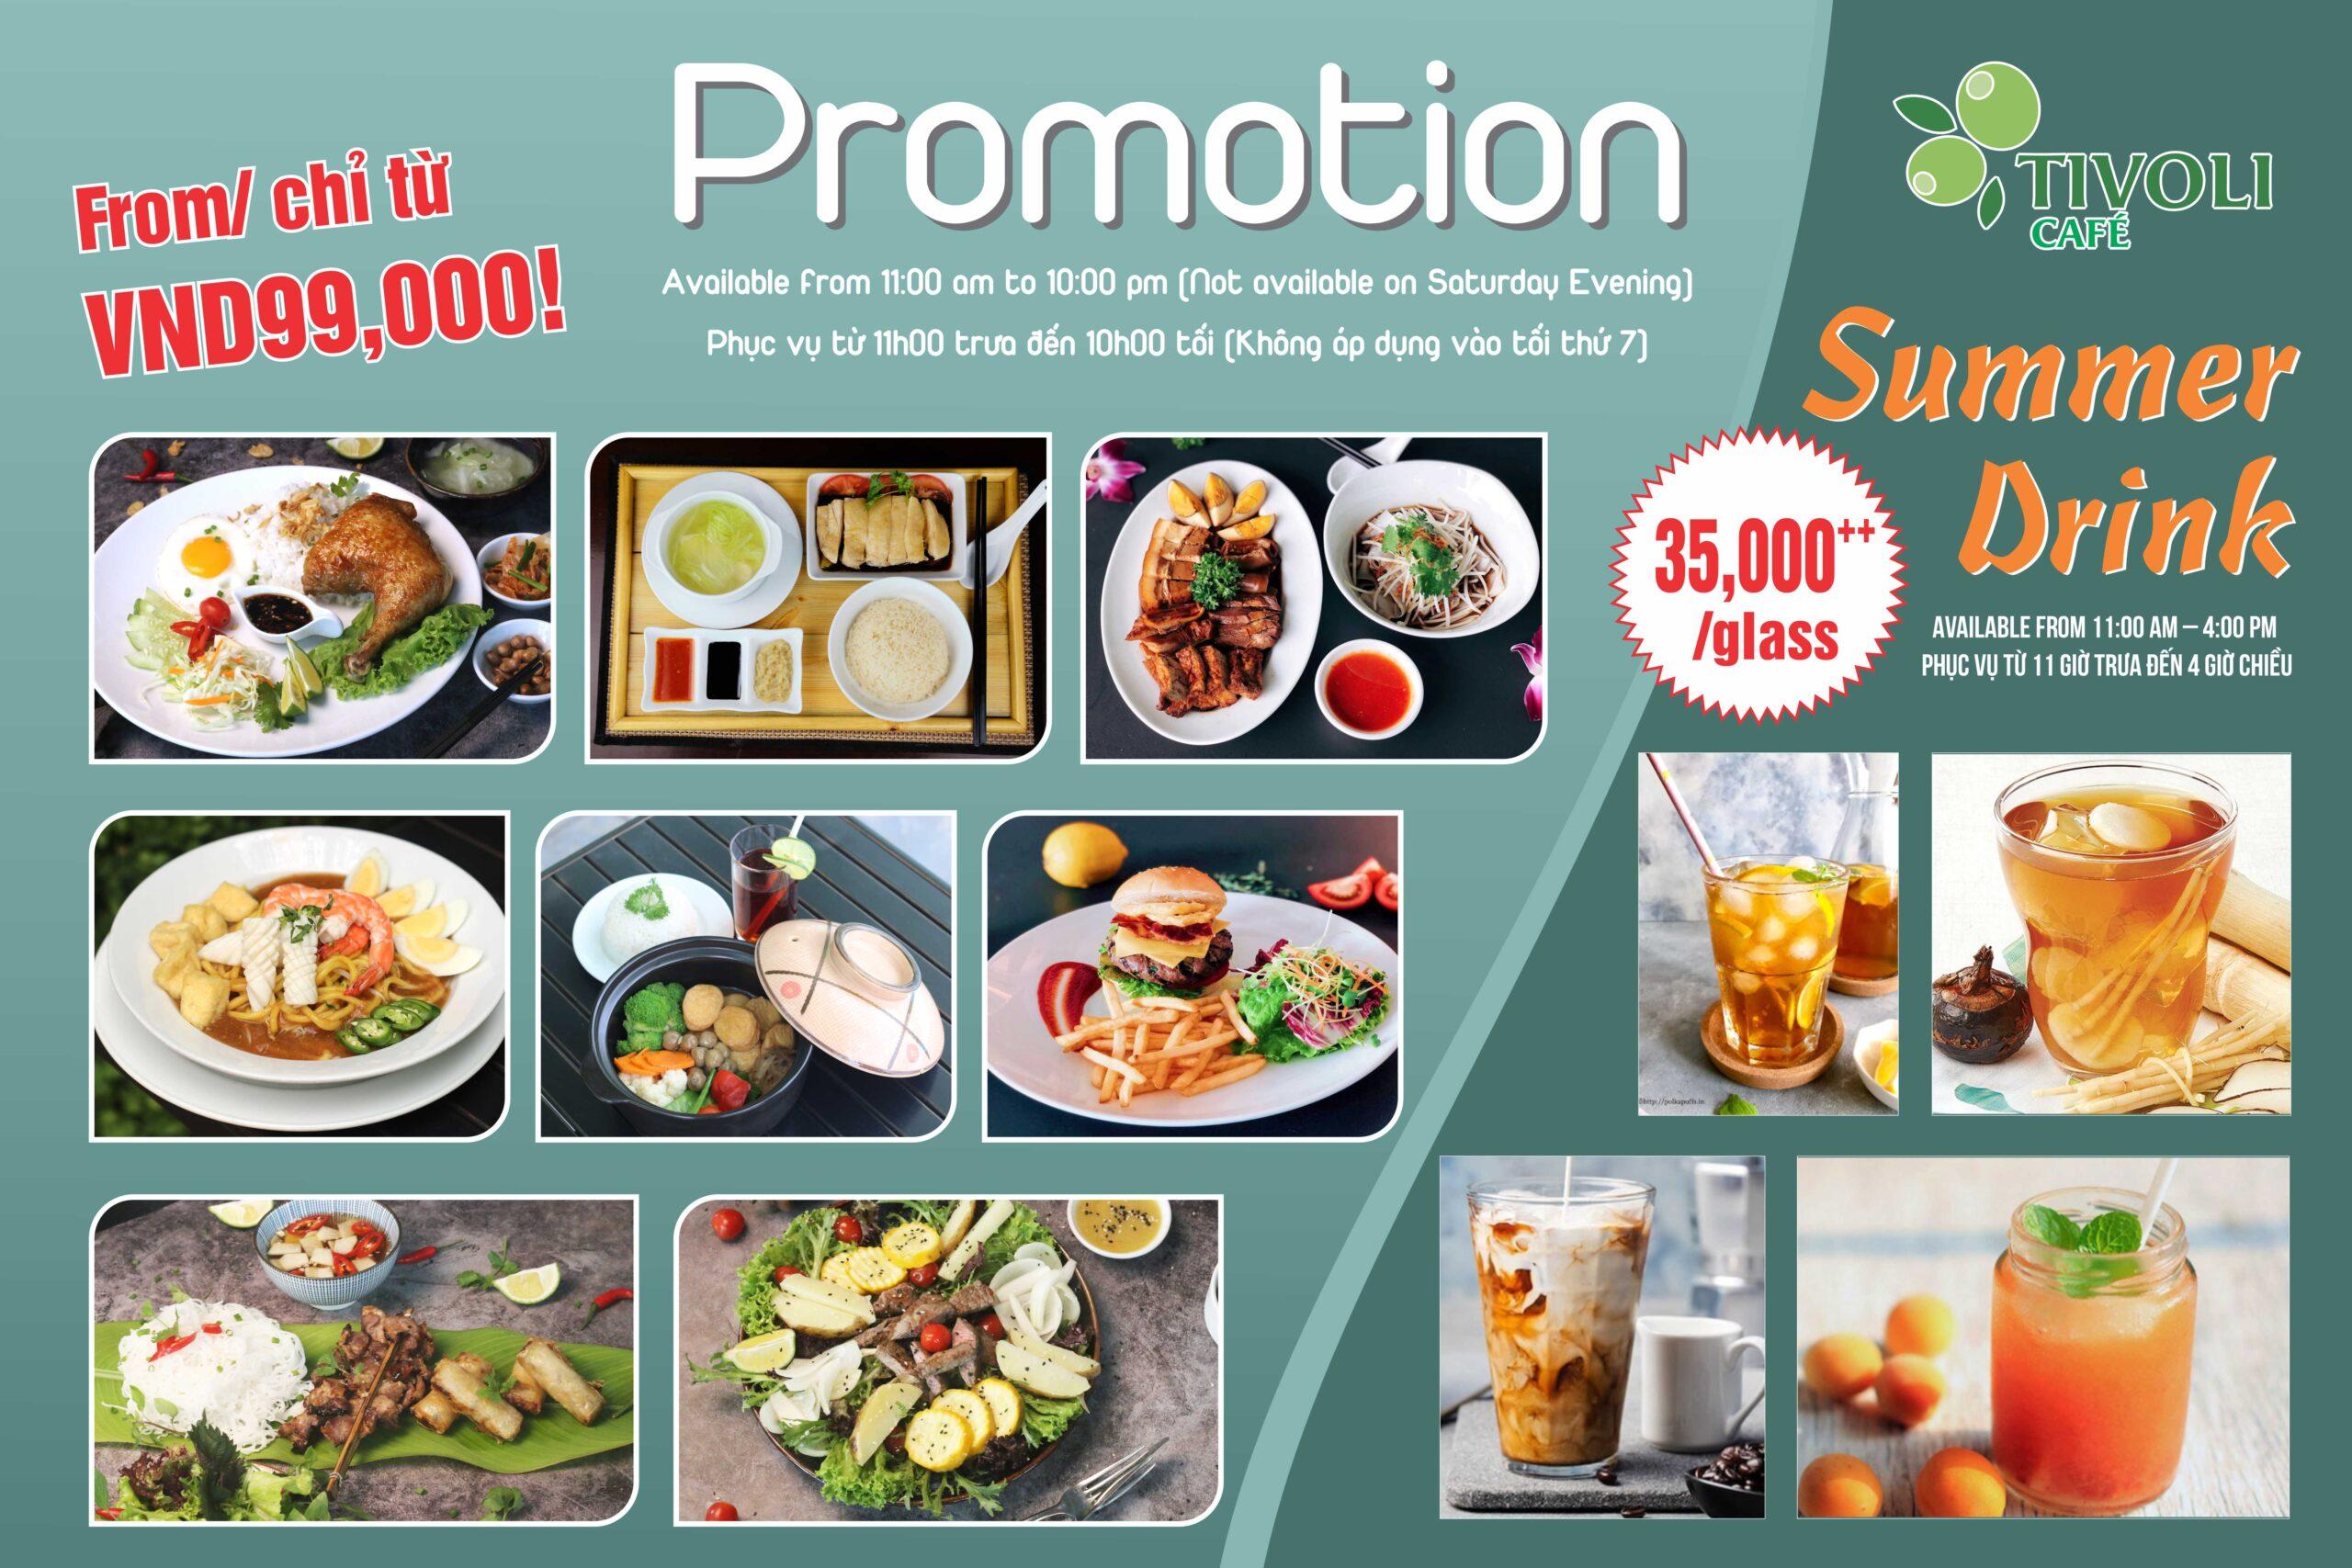 Tivoli Promotion